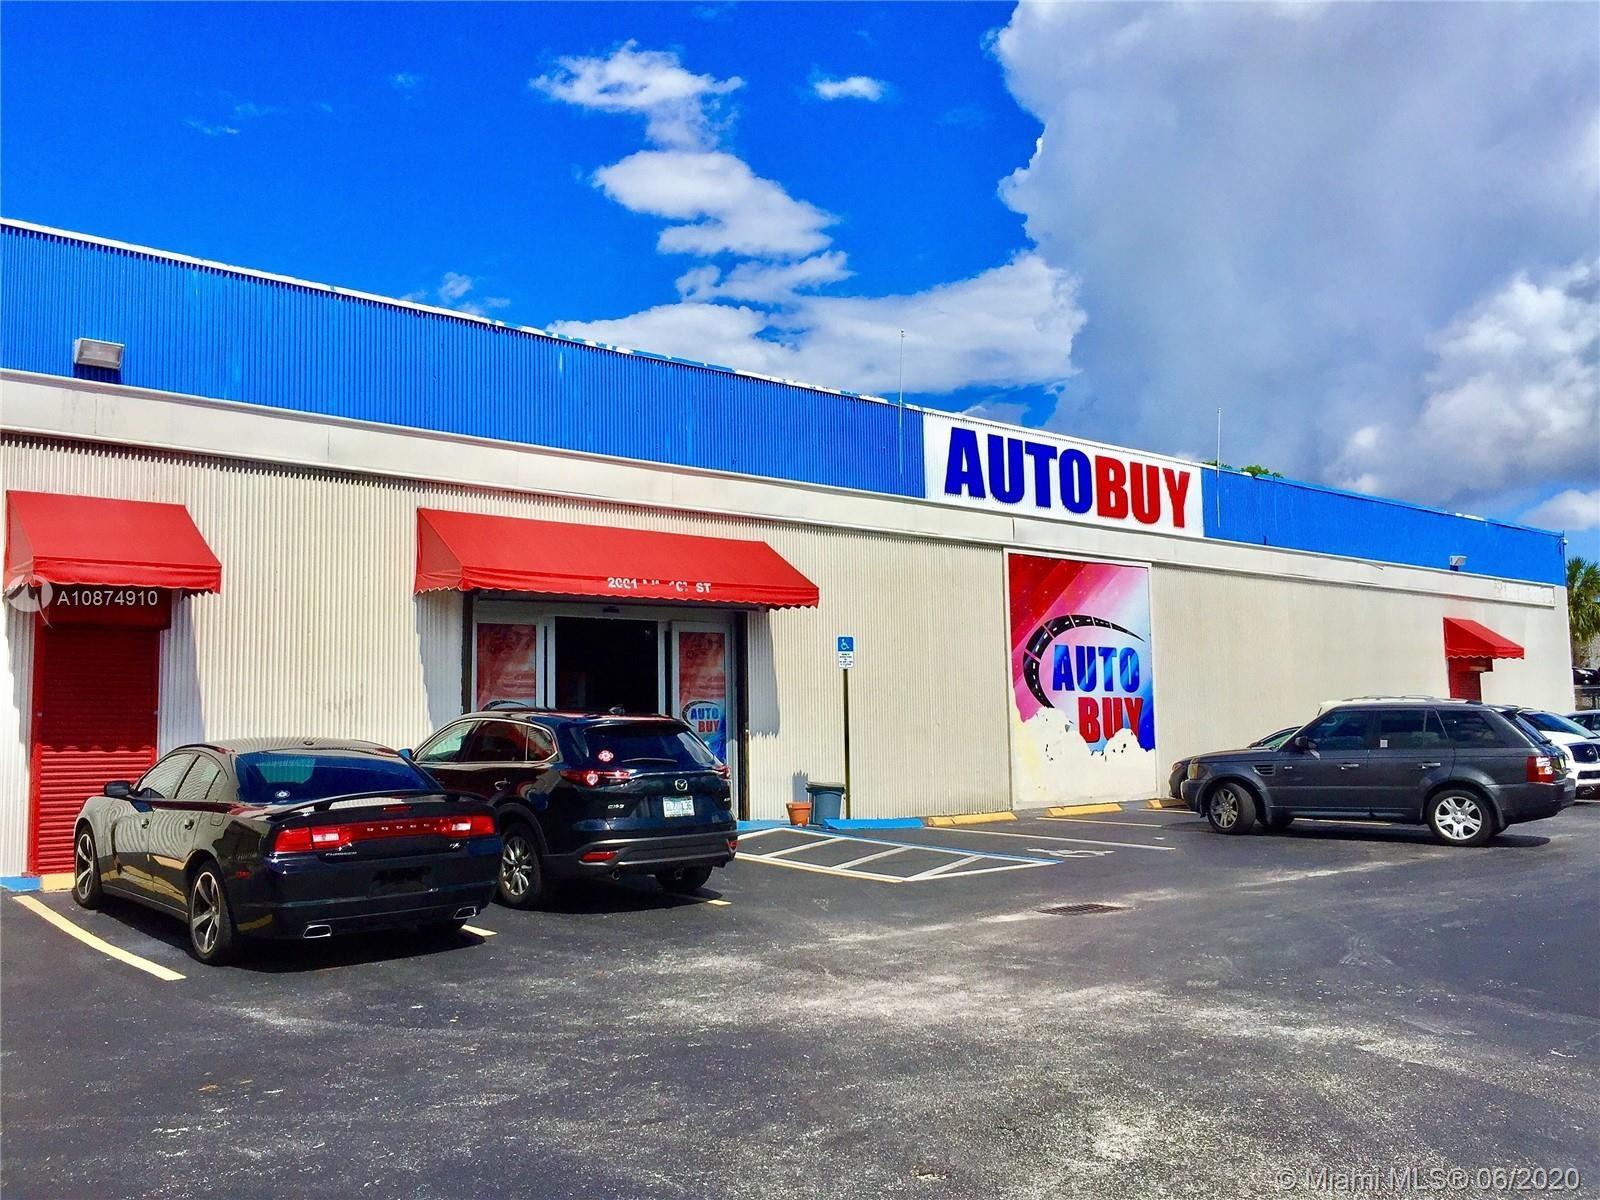 2001 NW 167 ST, Miami, FL 33056